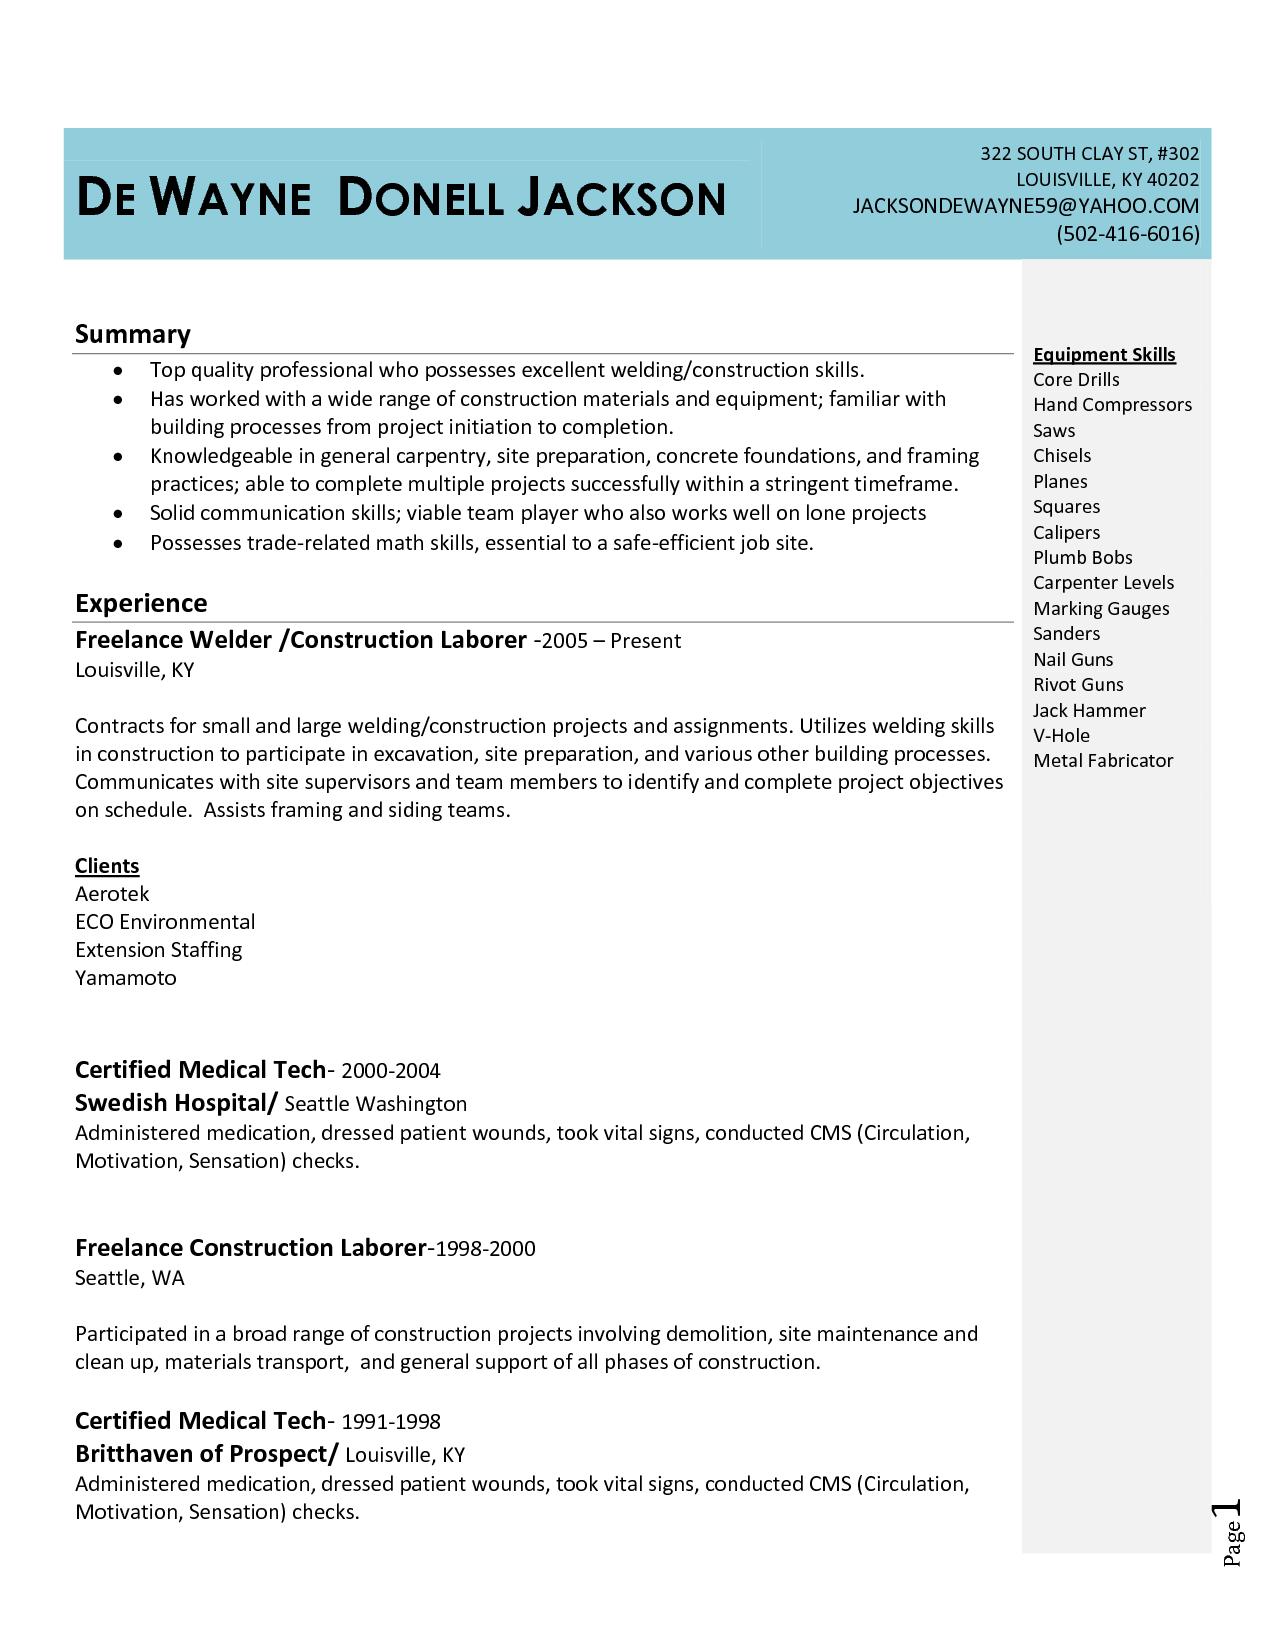 Unique Welder Resume Google Search Resume Examples Resume Sample Resume